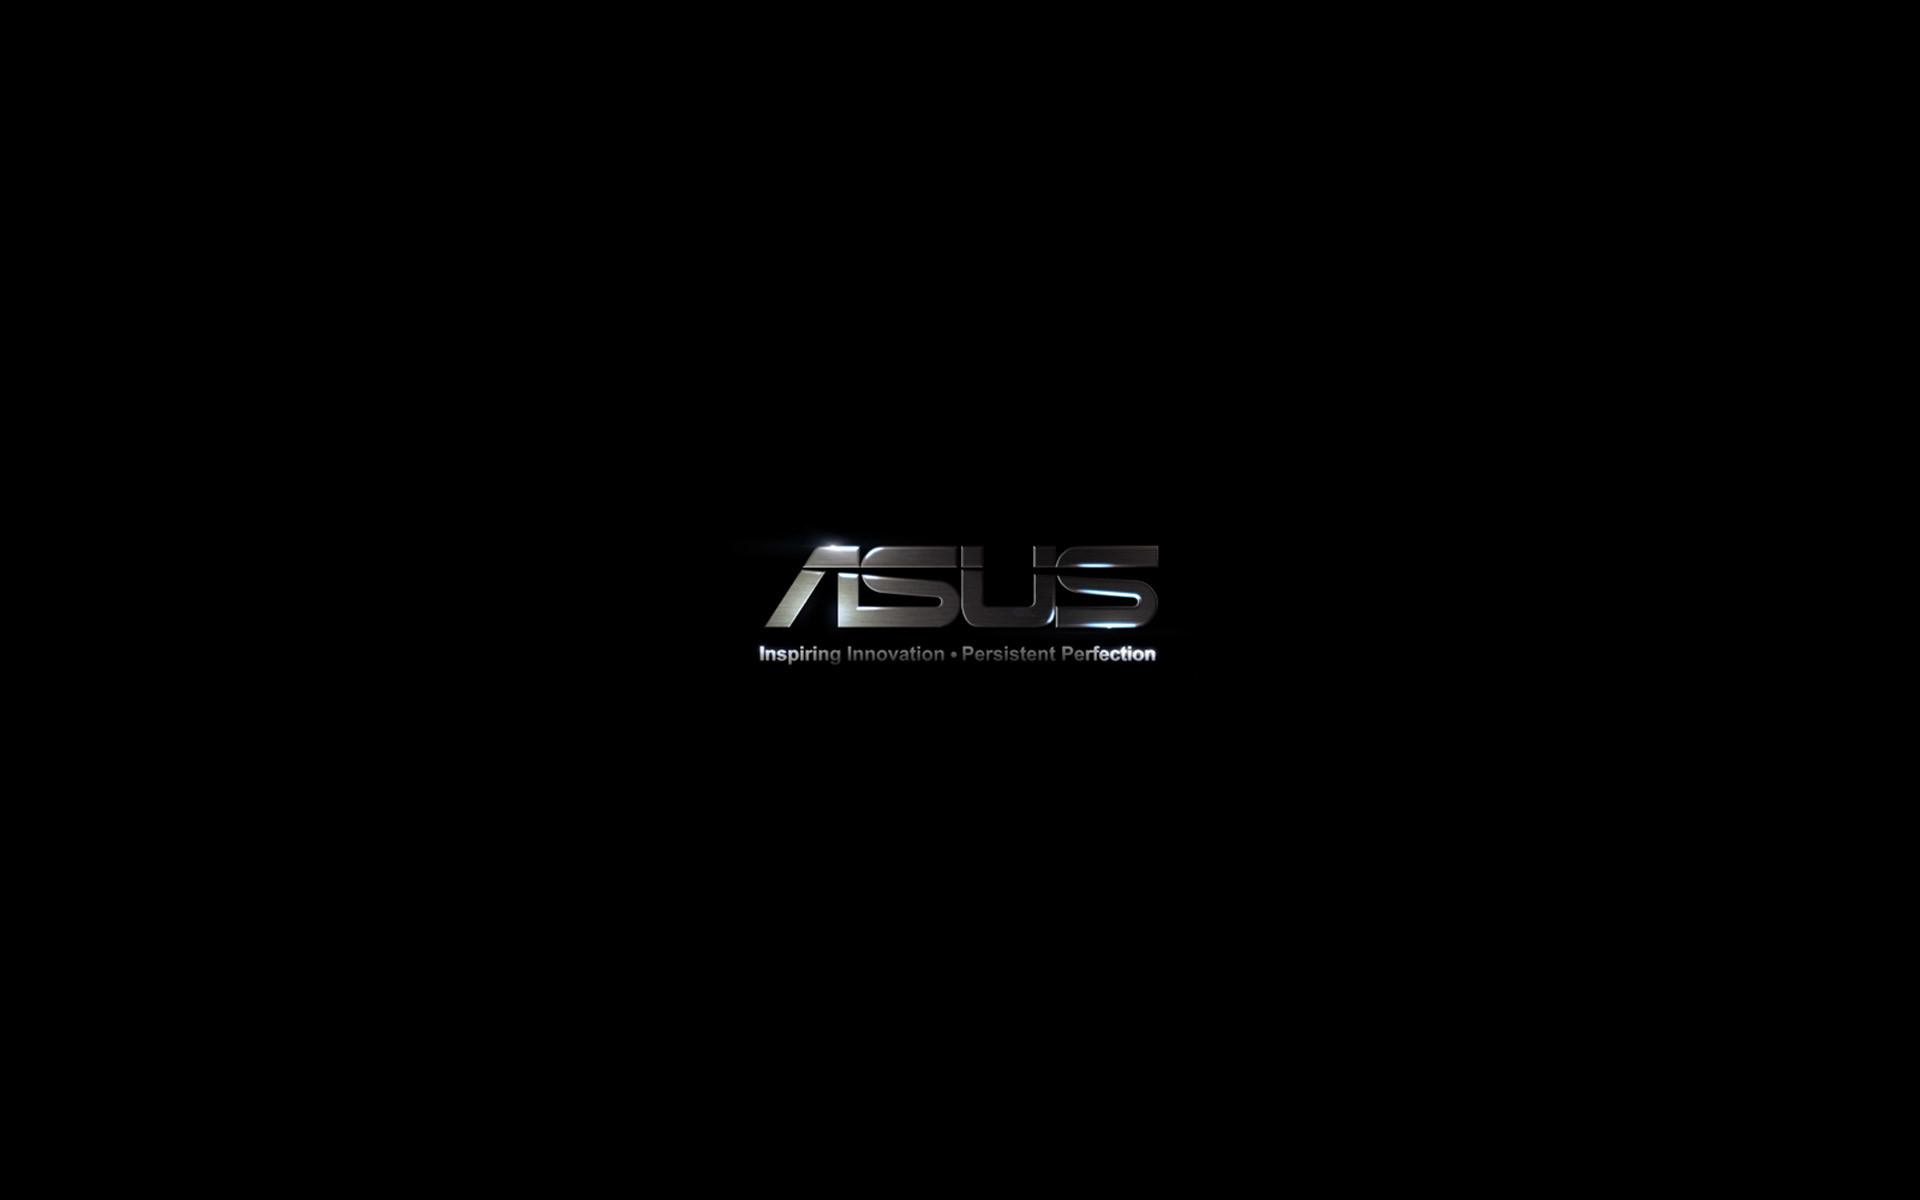 Asus Wallpapers – Full HD wallpaper search